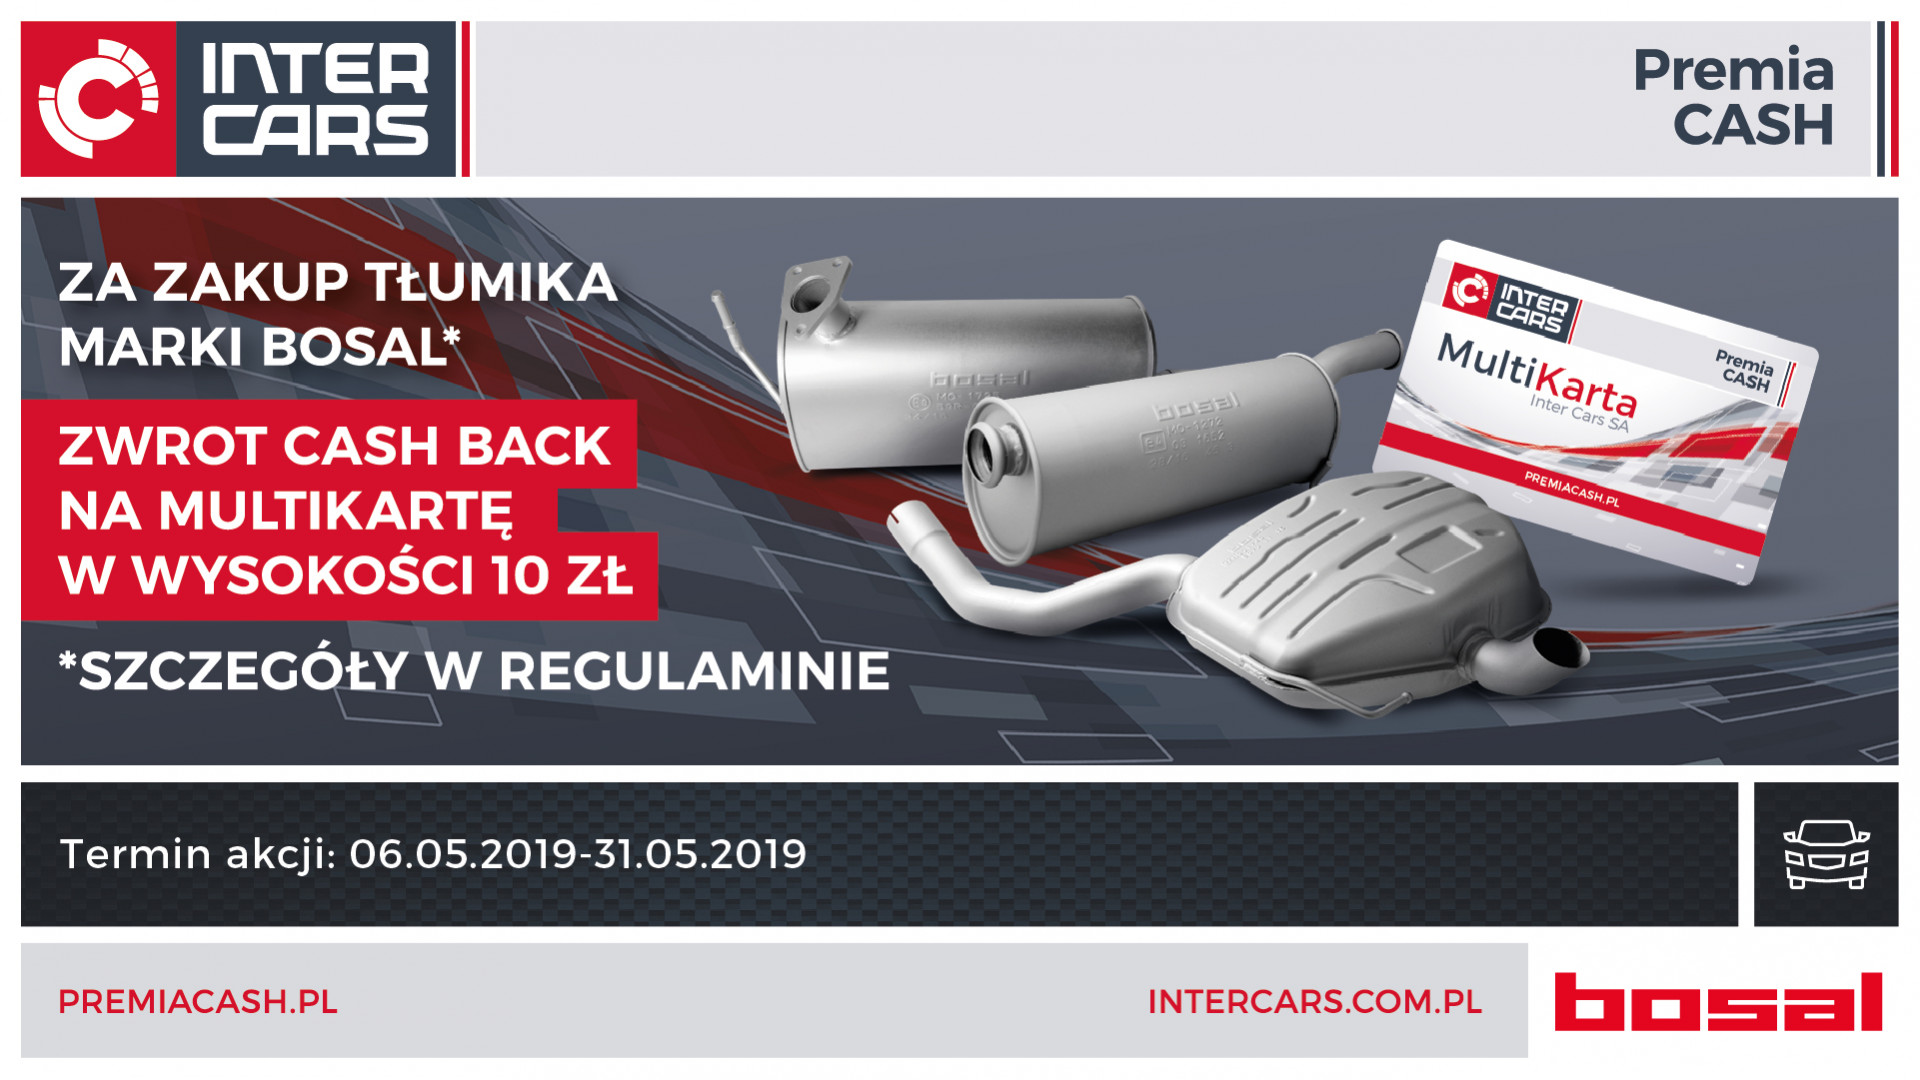 bosal_premia_cash_za_zakup_tlumika_zwrot_cash_back_na_multikarte_1920x1080.jpg